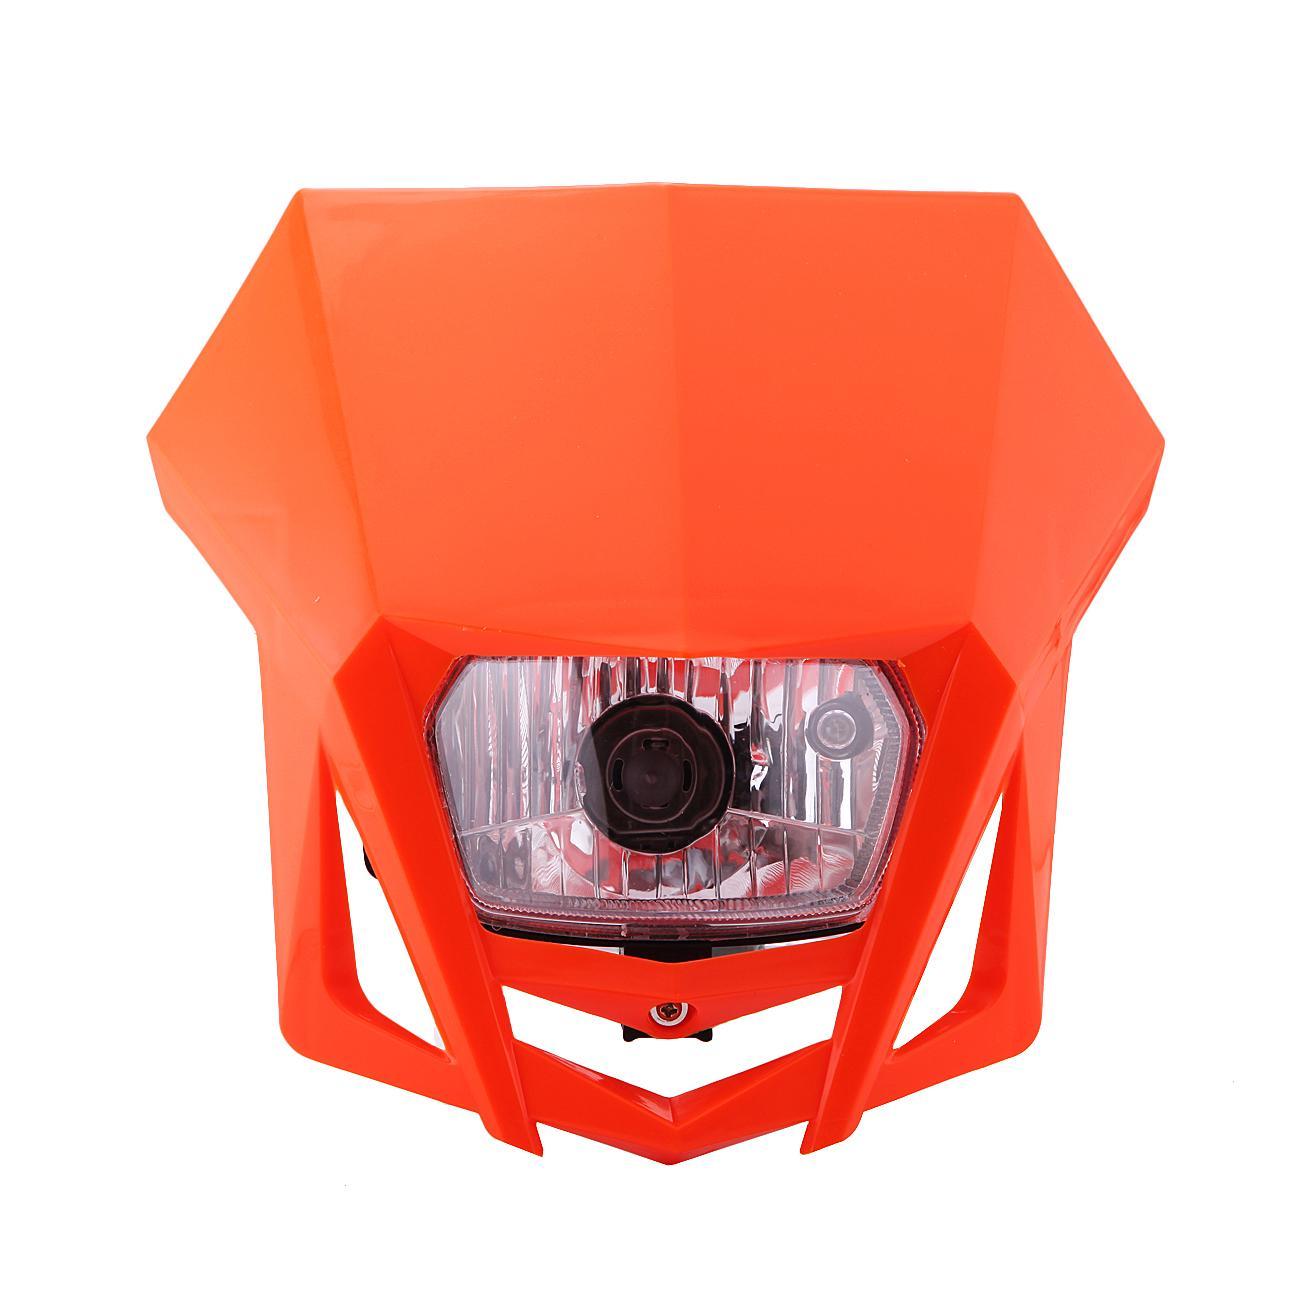 Kit de carenado de faro de motocicleta de 12V Enduro Universal para Yamaha WR450F YZ250F XT250X XT600 TTR250/Kawasaki KLX150